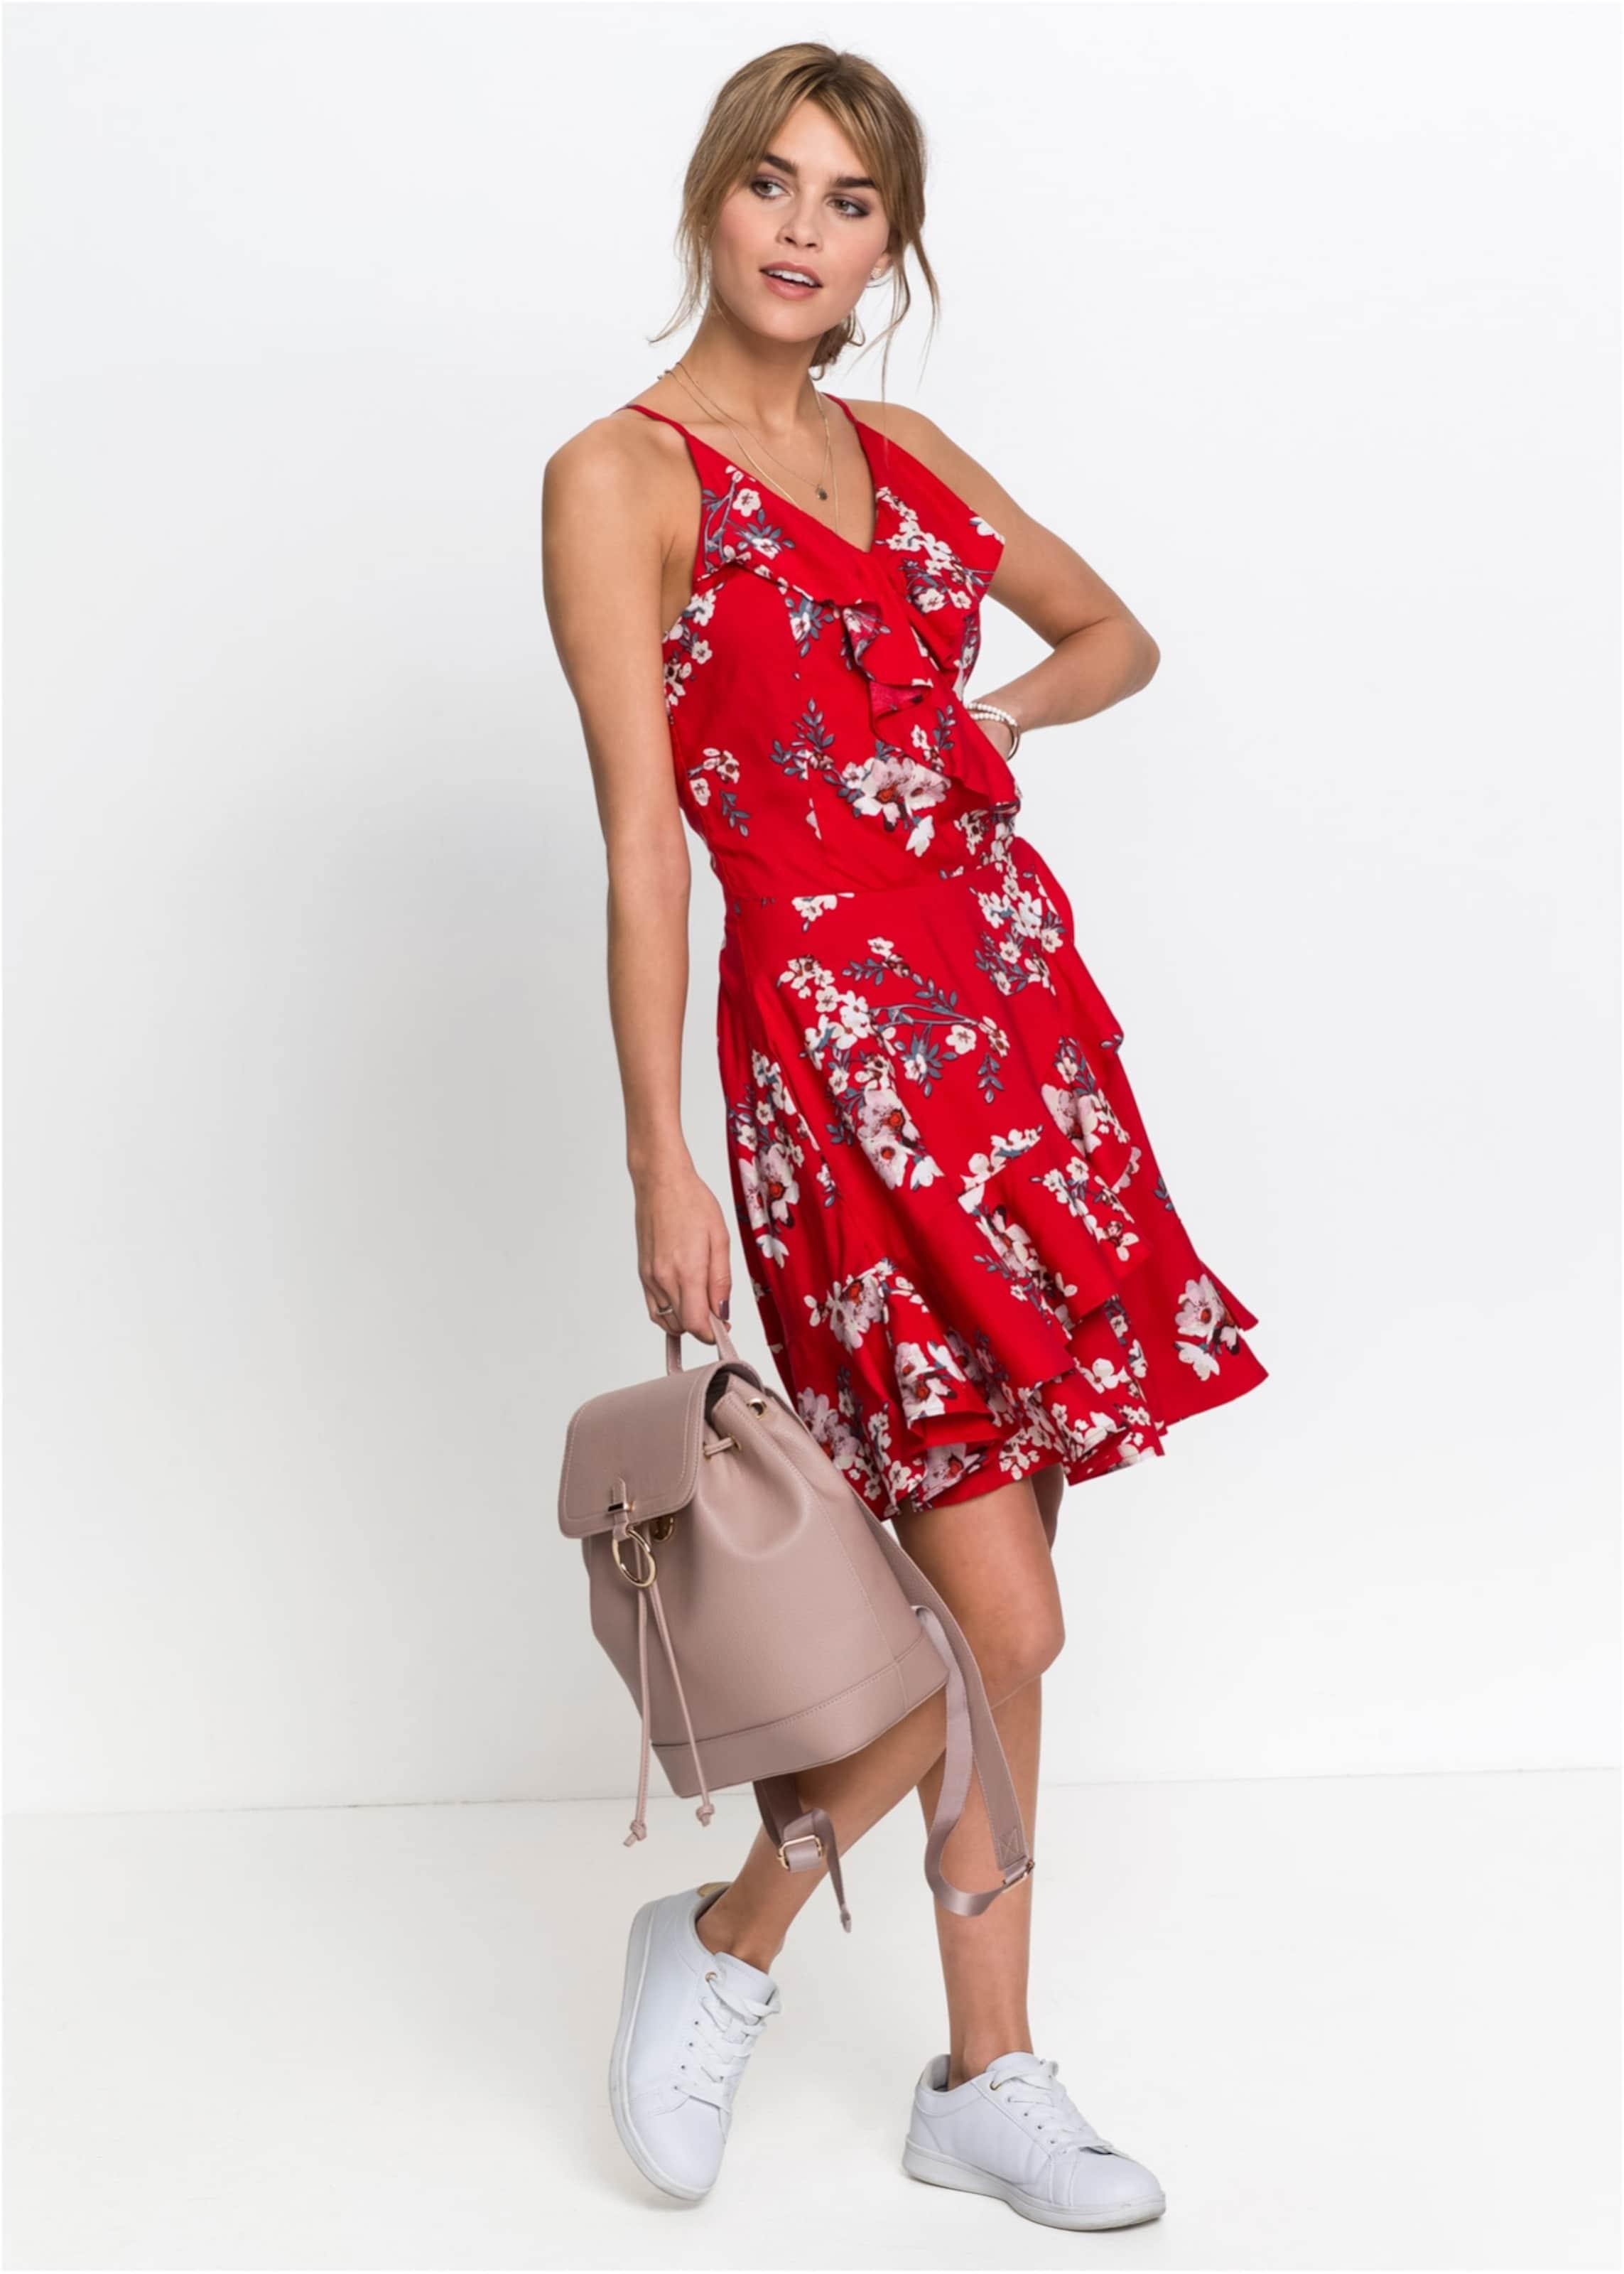 Bonprix Bonprix Kleid MischfarbenOrangerot In Kleid In Kleid In MischfarbenOrangerot Bonprix Yf7I6vbgy